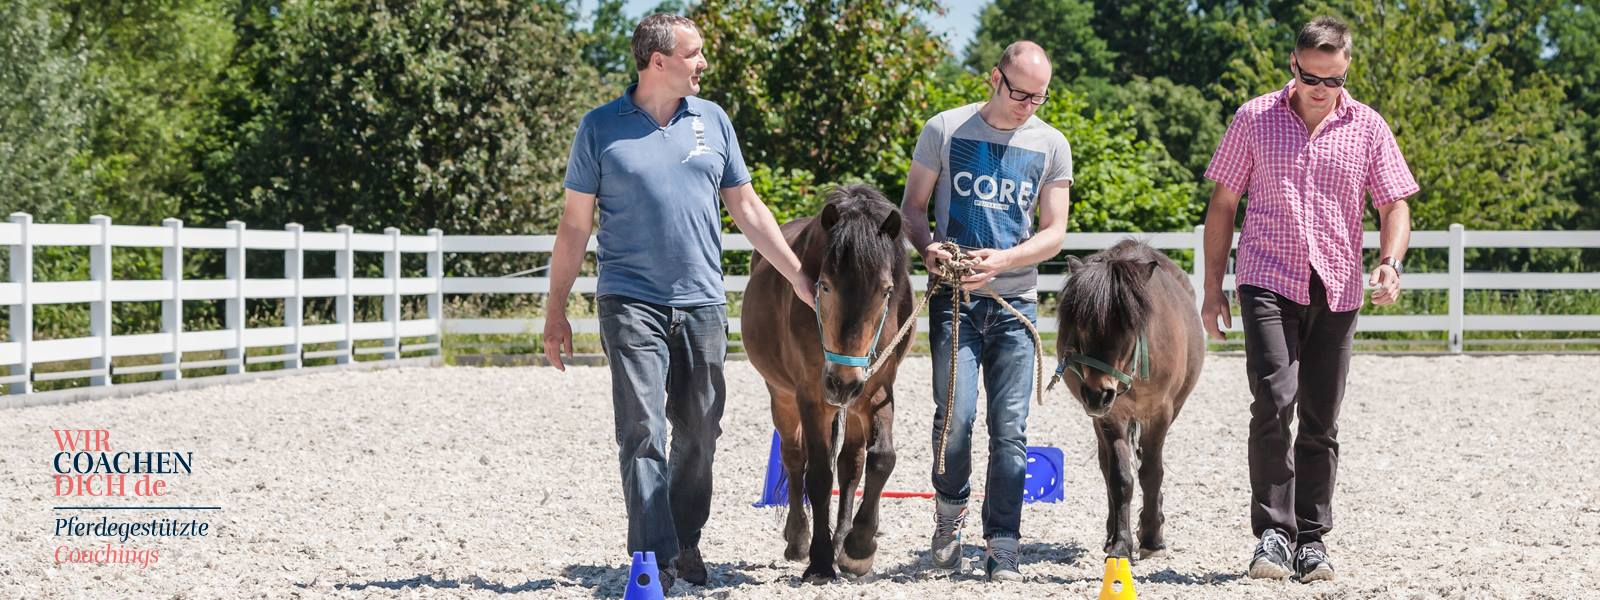 PferdegestütztesCoaching, Führung, Führungskräfte, Dresden, Radebeul, Teamtraining, Kommunikation